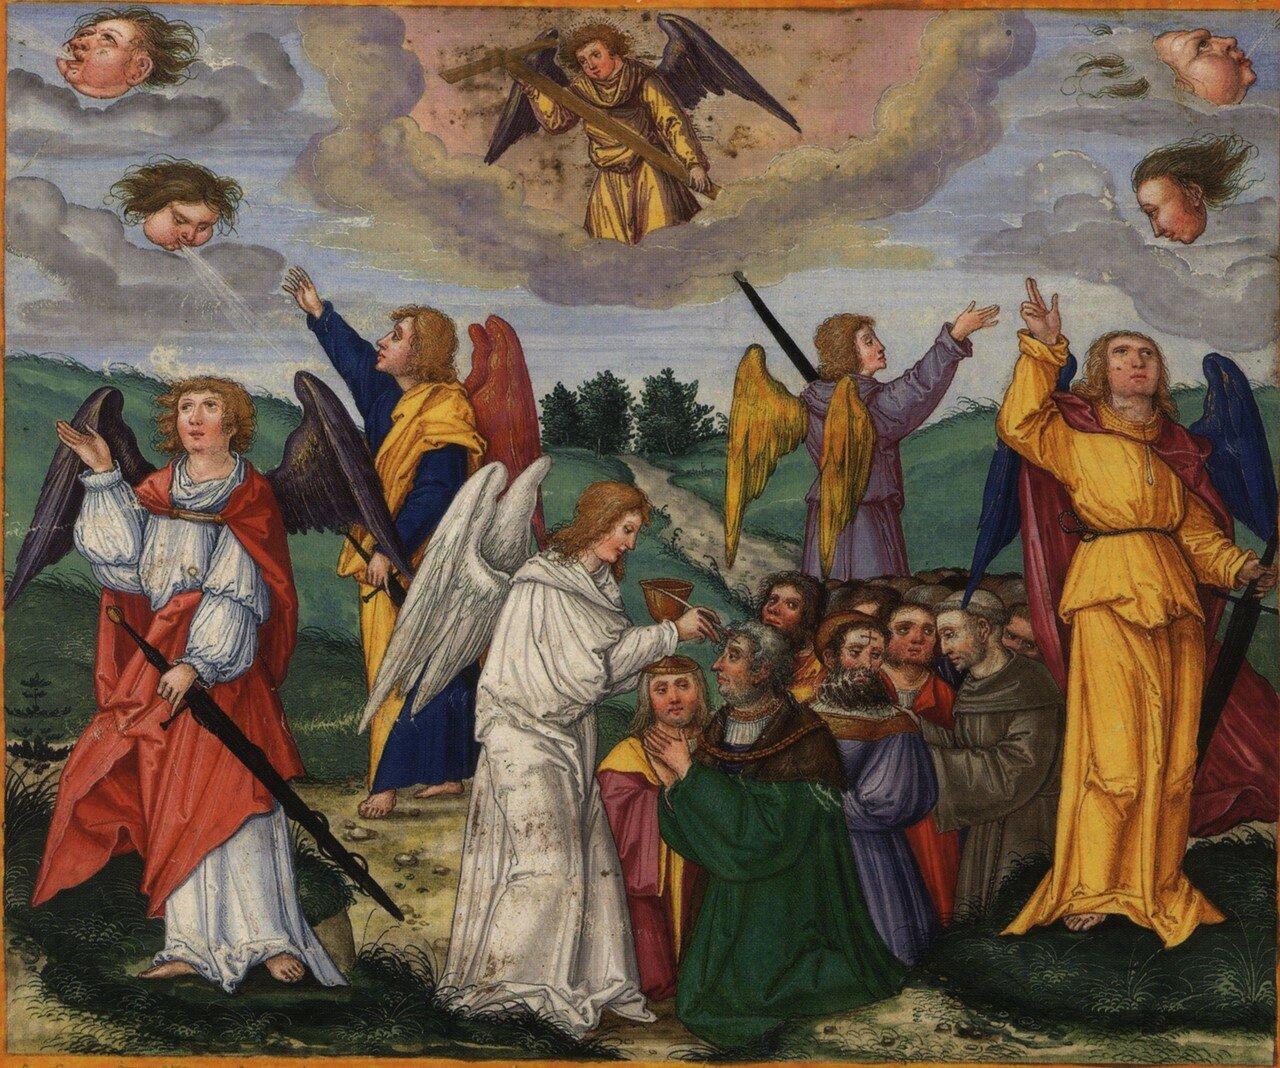 Ottheinrich_Folio290r_Rev7A.jpg